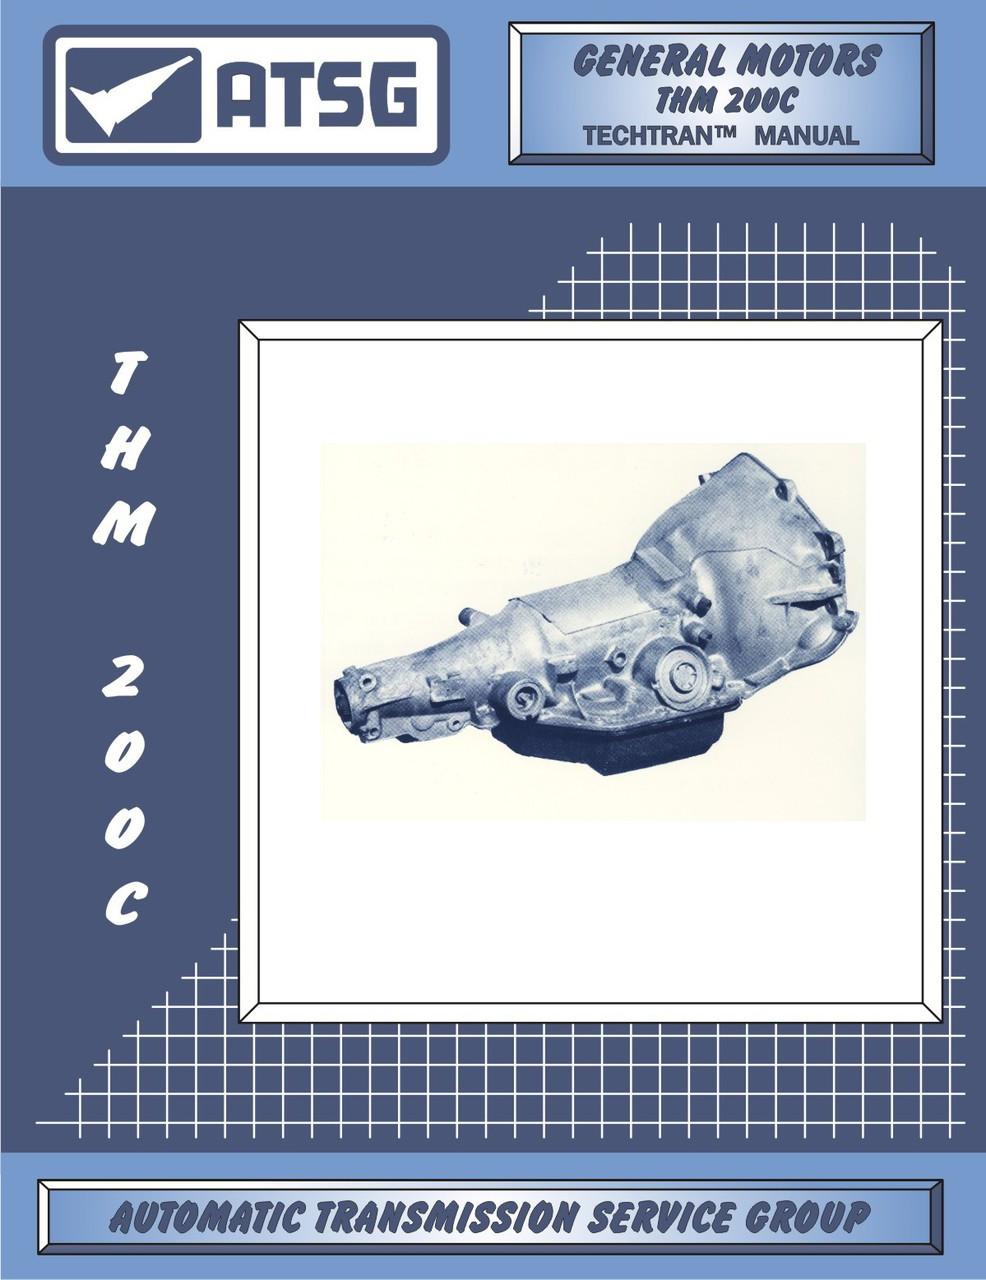 hight resolution of tm200c